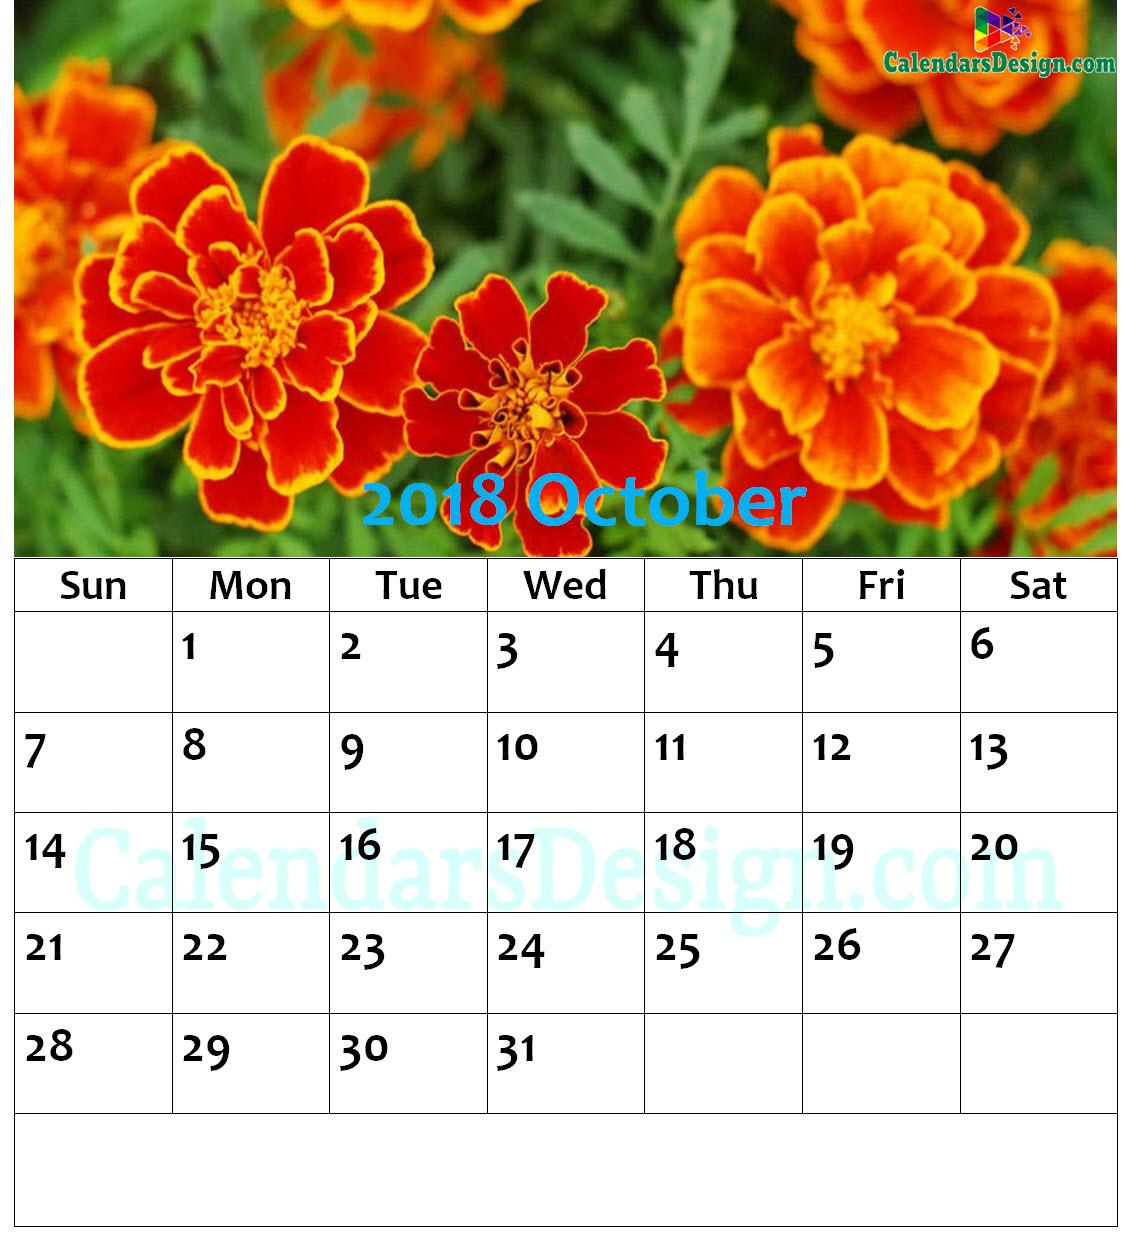 October 2018 Wall Calendar